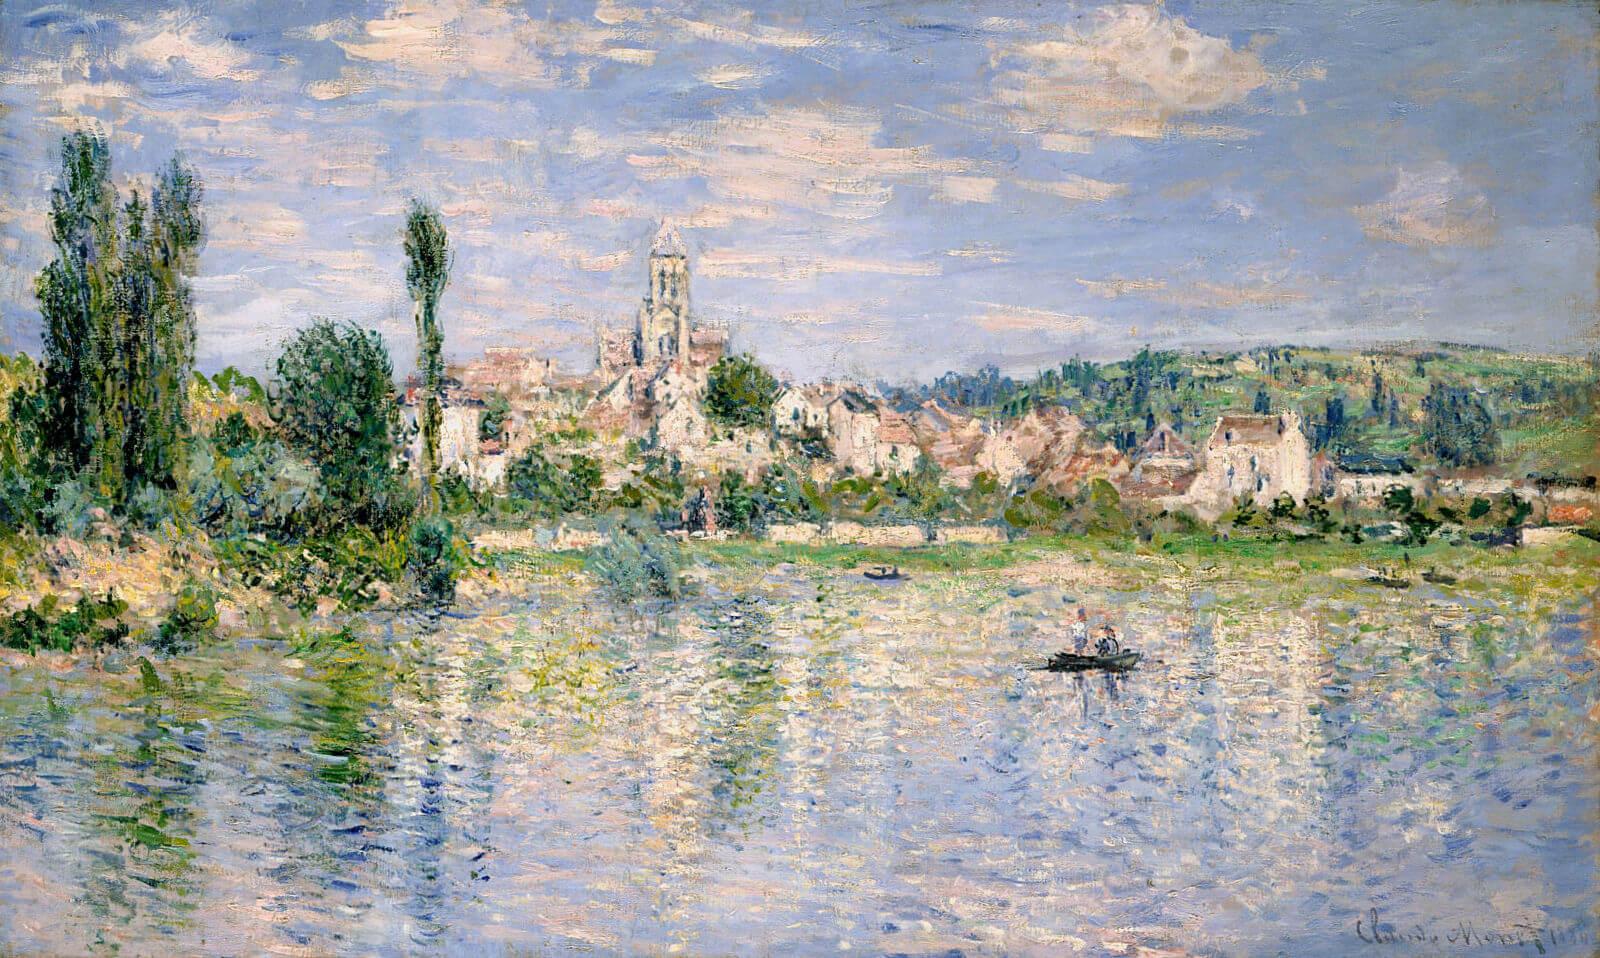 Ветёй летом - Клод Моне (1880, Метрополитен-музей, Нью-Йорк)